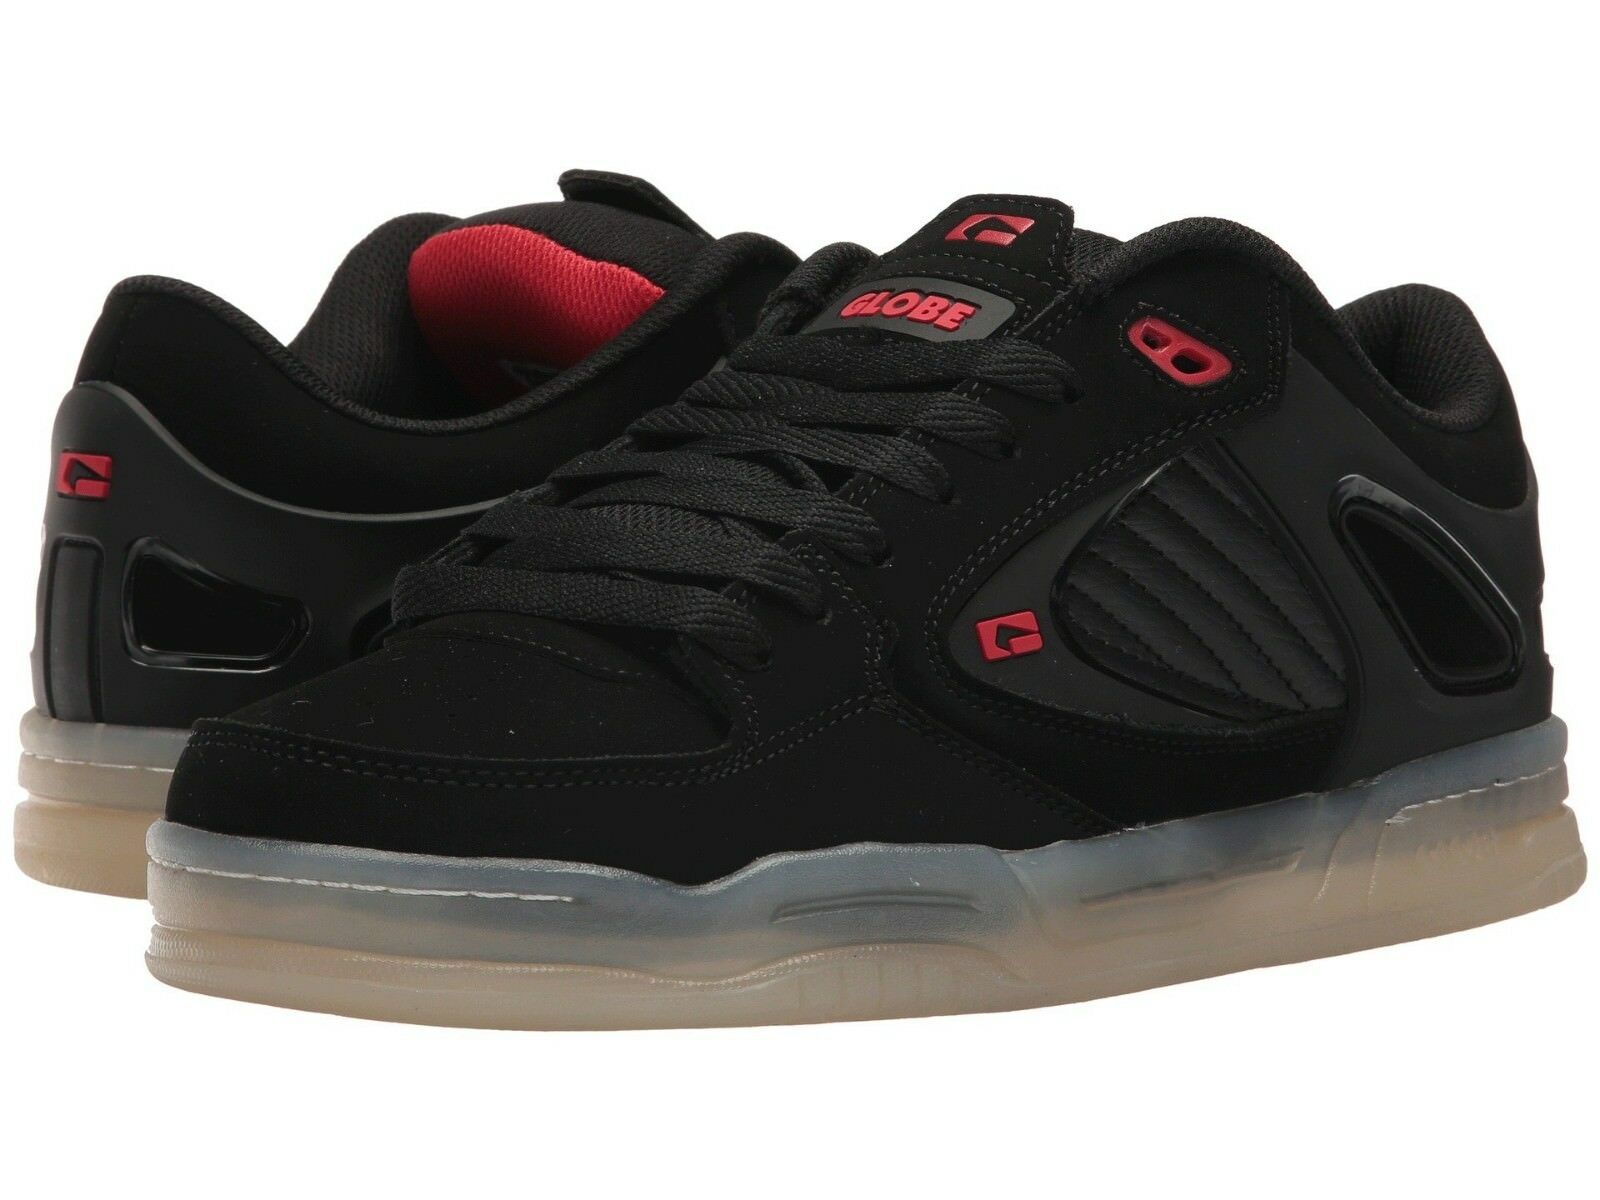 Homme GLOBE AGENT SKATEBOARDING Chaussures NIB Noir Blanc RED